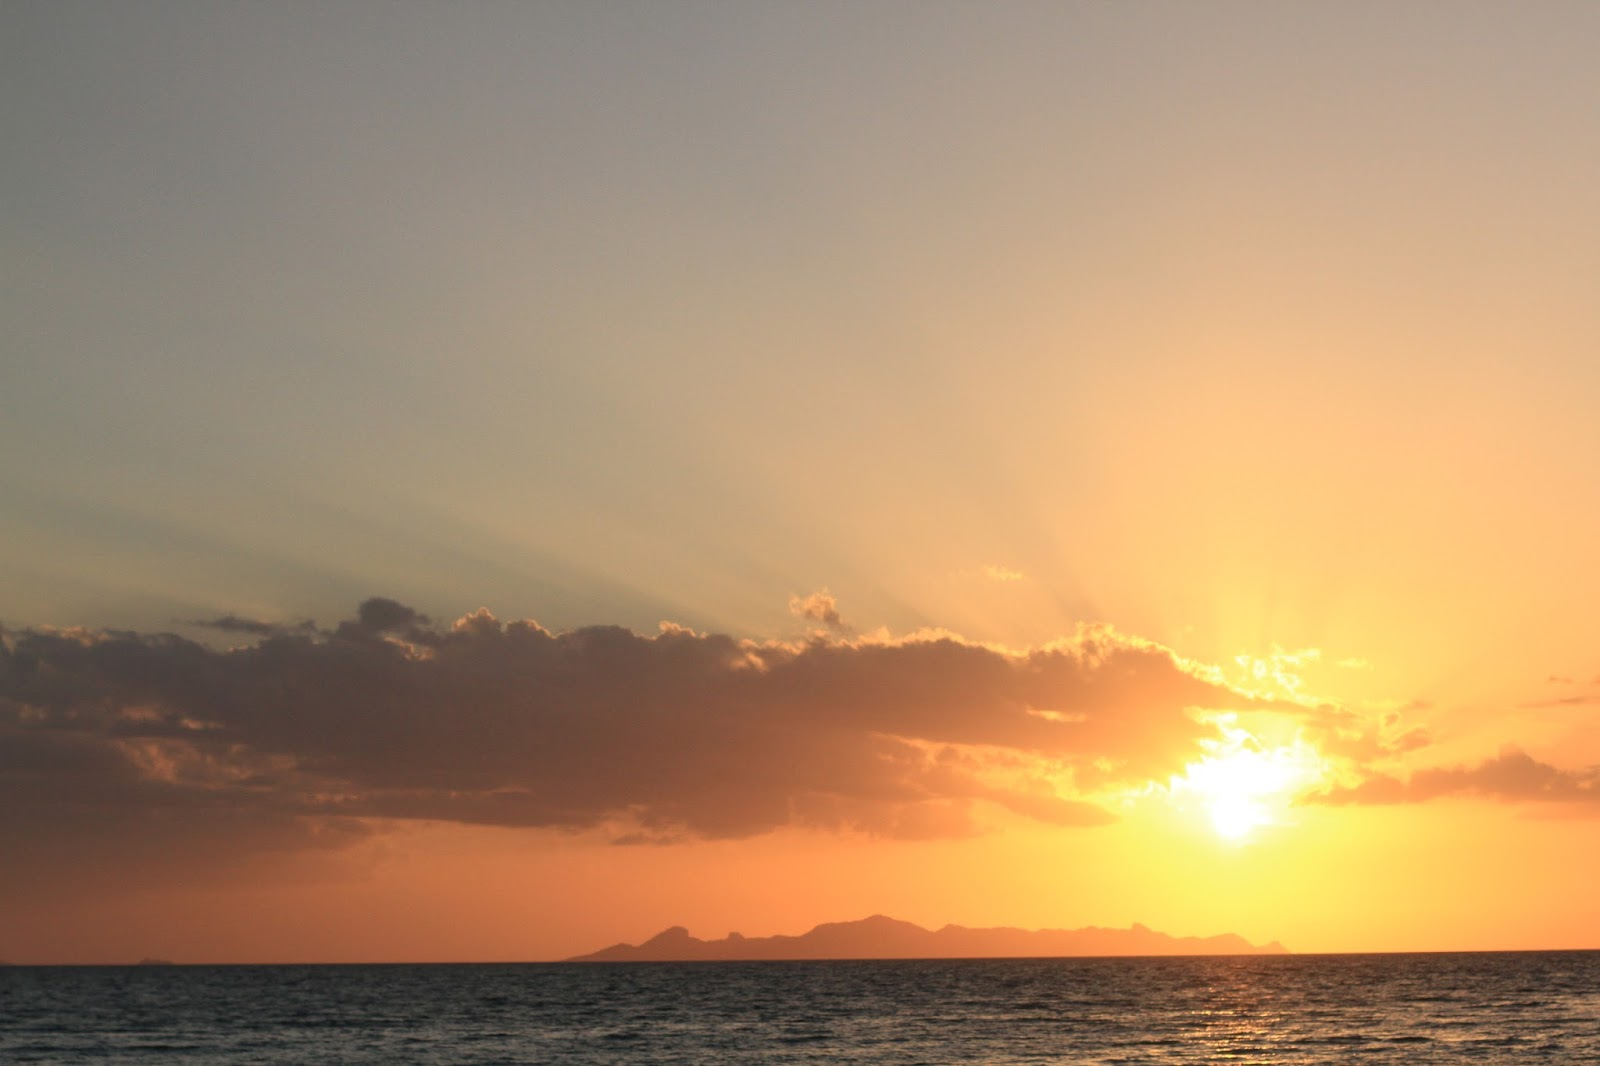 Koh Samui Sunset by Cherry May Ward Photography